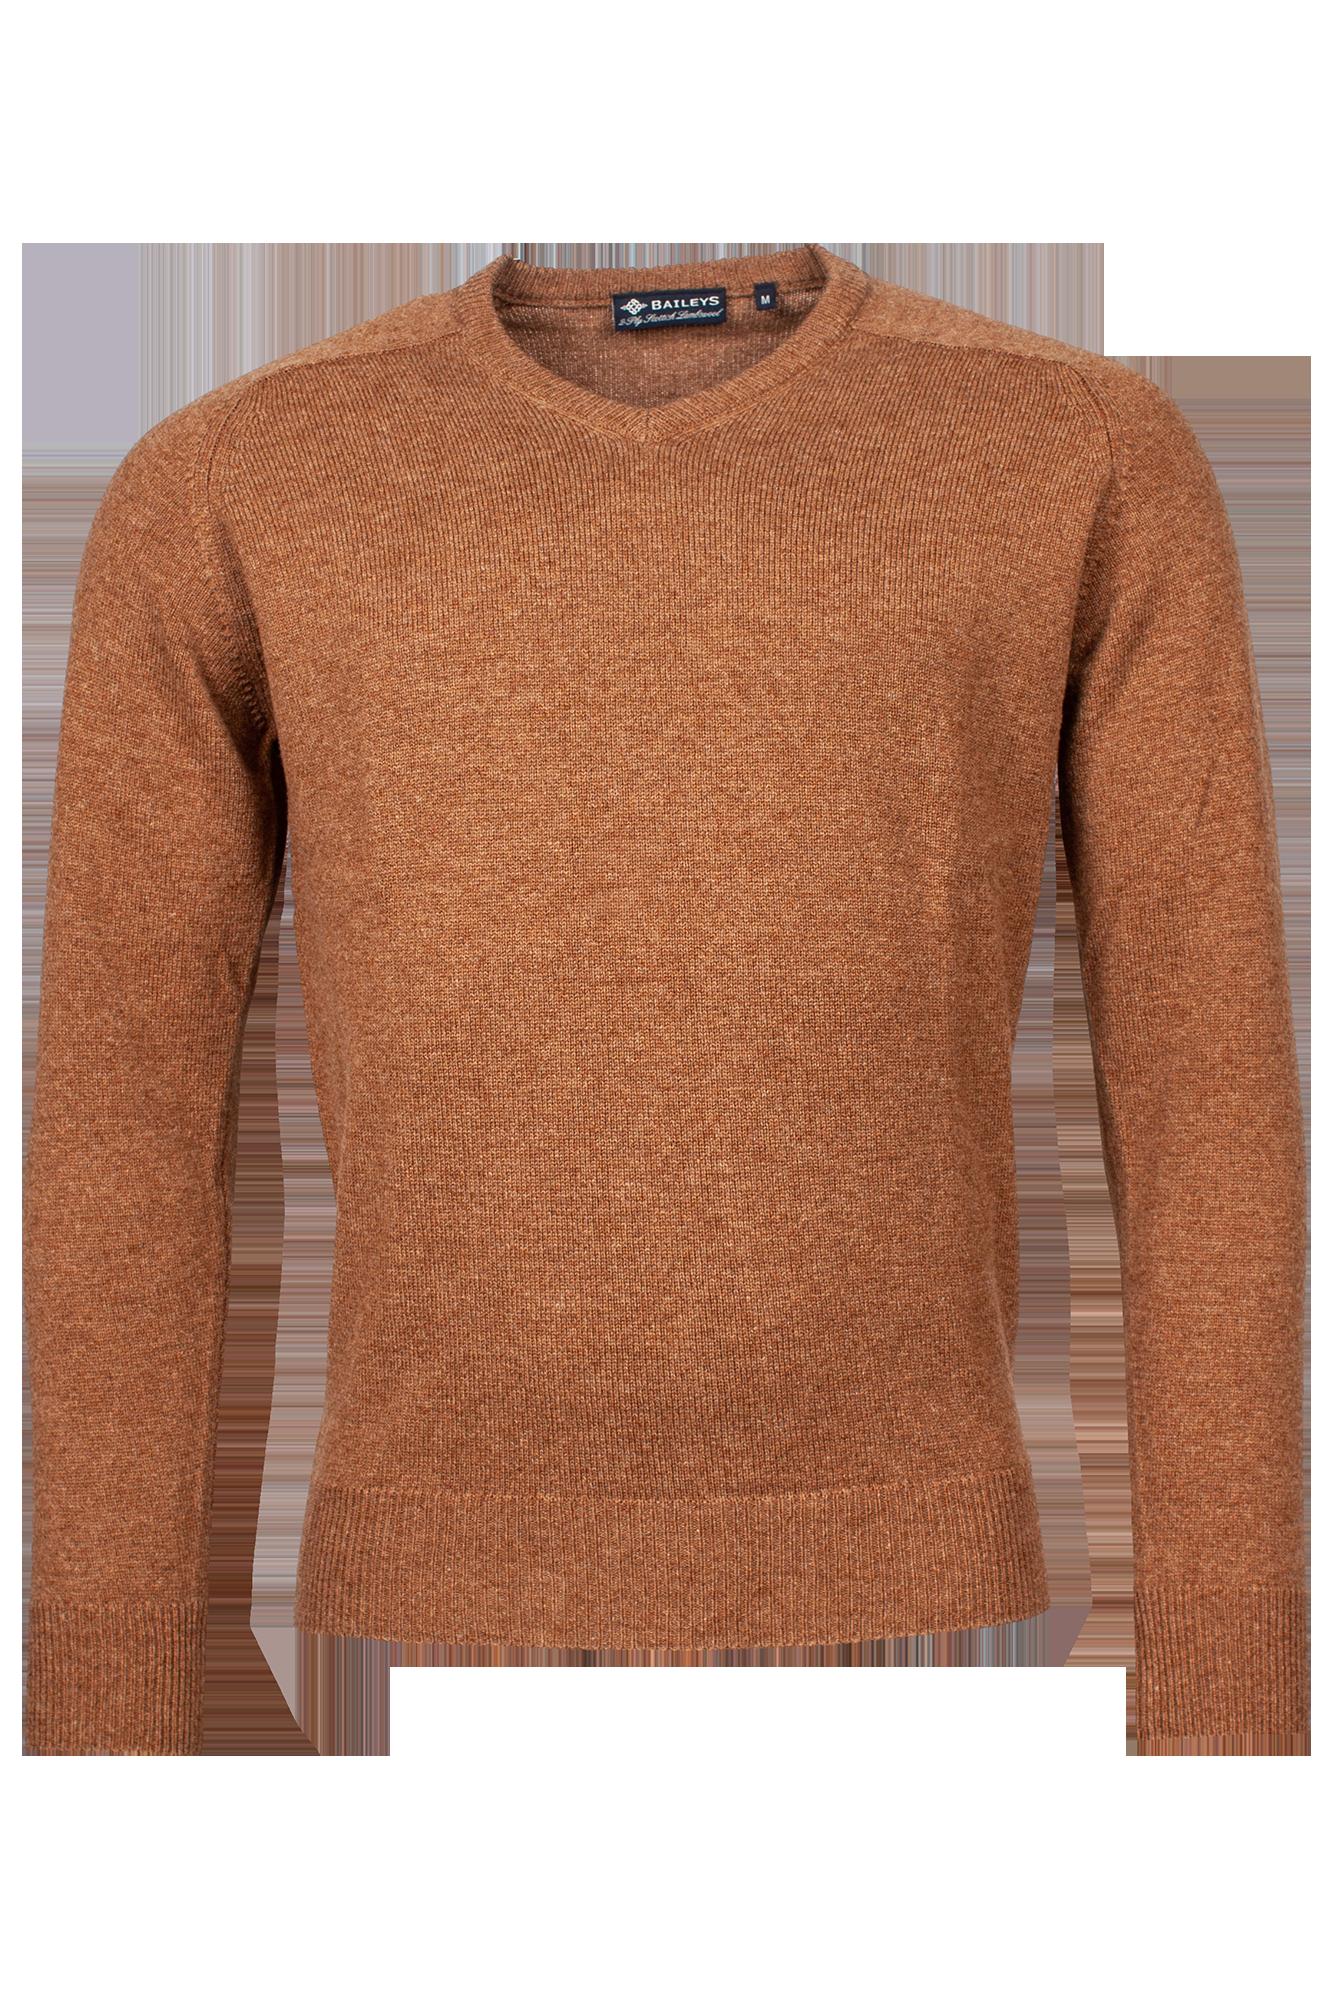 Baileys lamswollen pullover, v-hals, camel